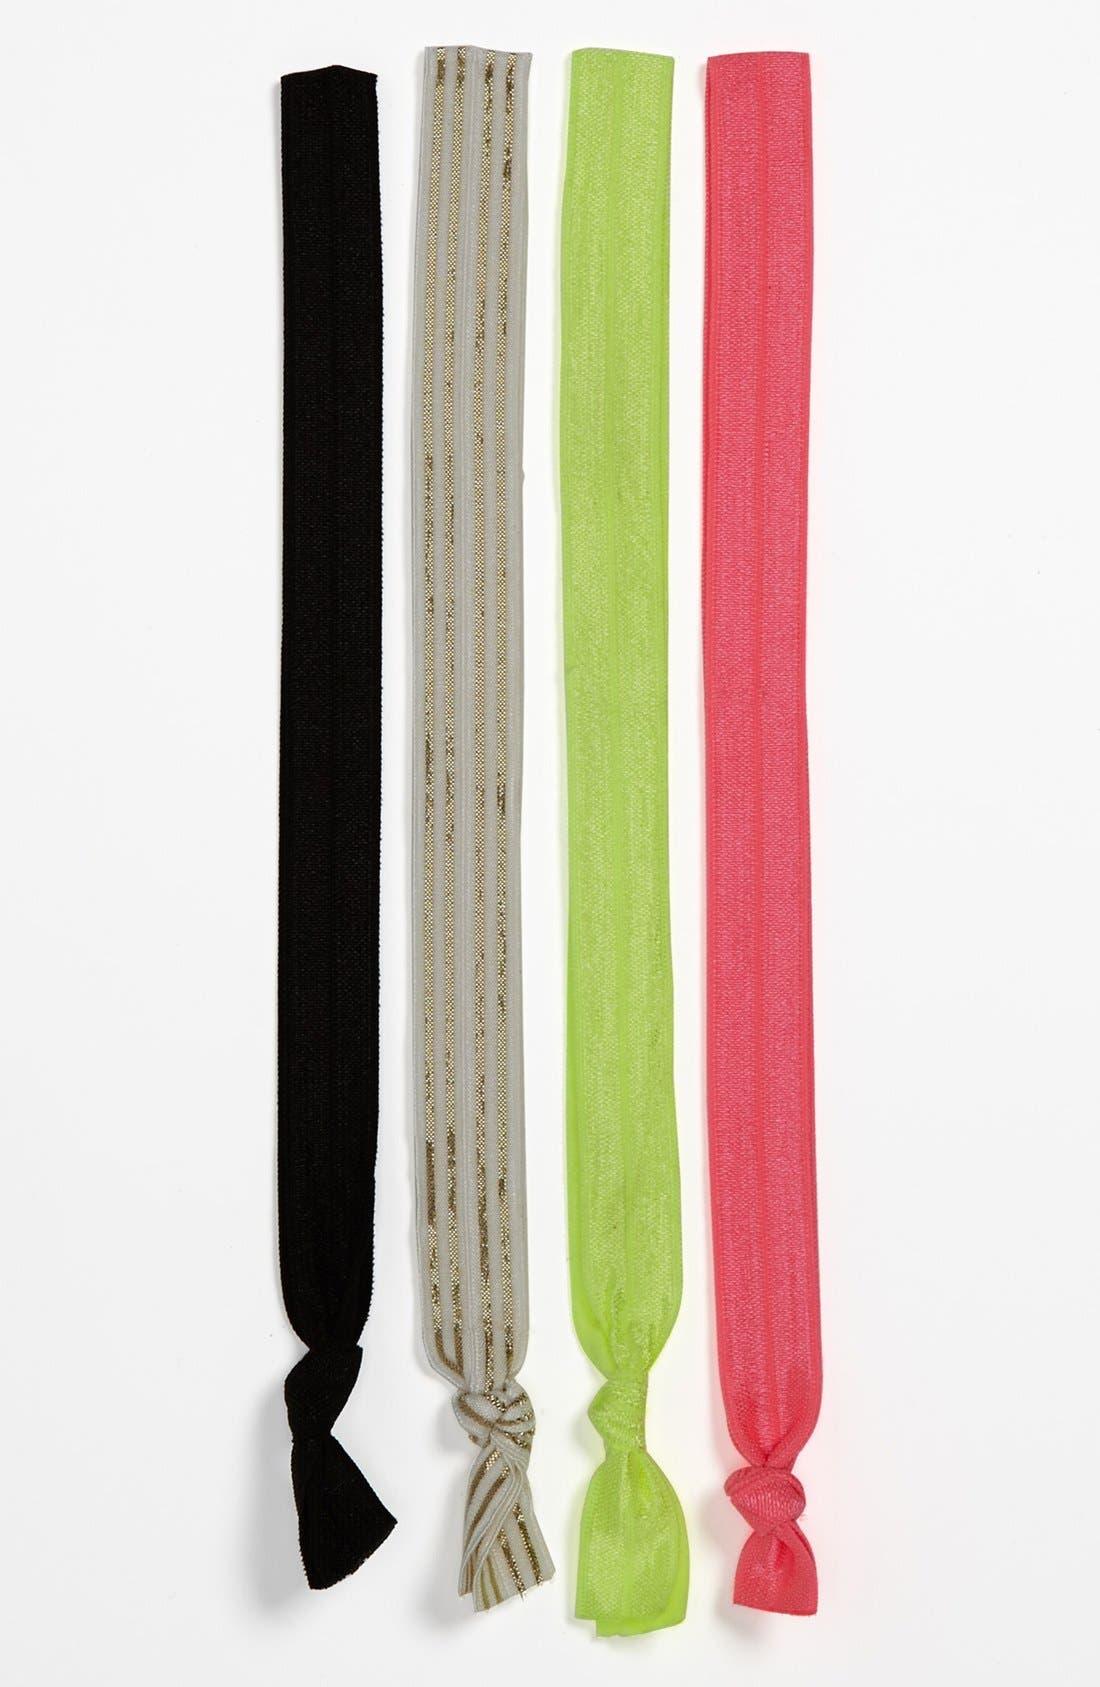 Main Image - BP. Stretch Headbands (Set of 4)